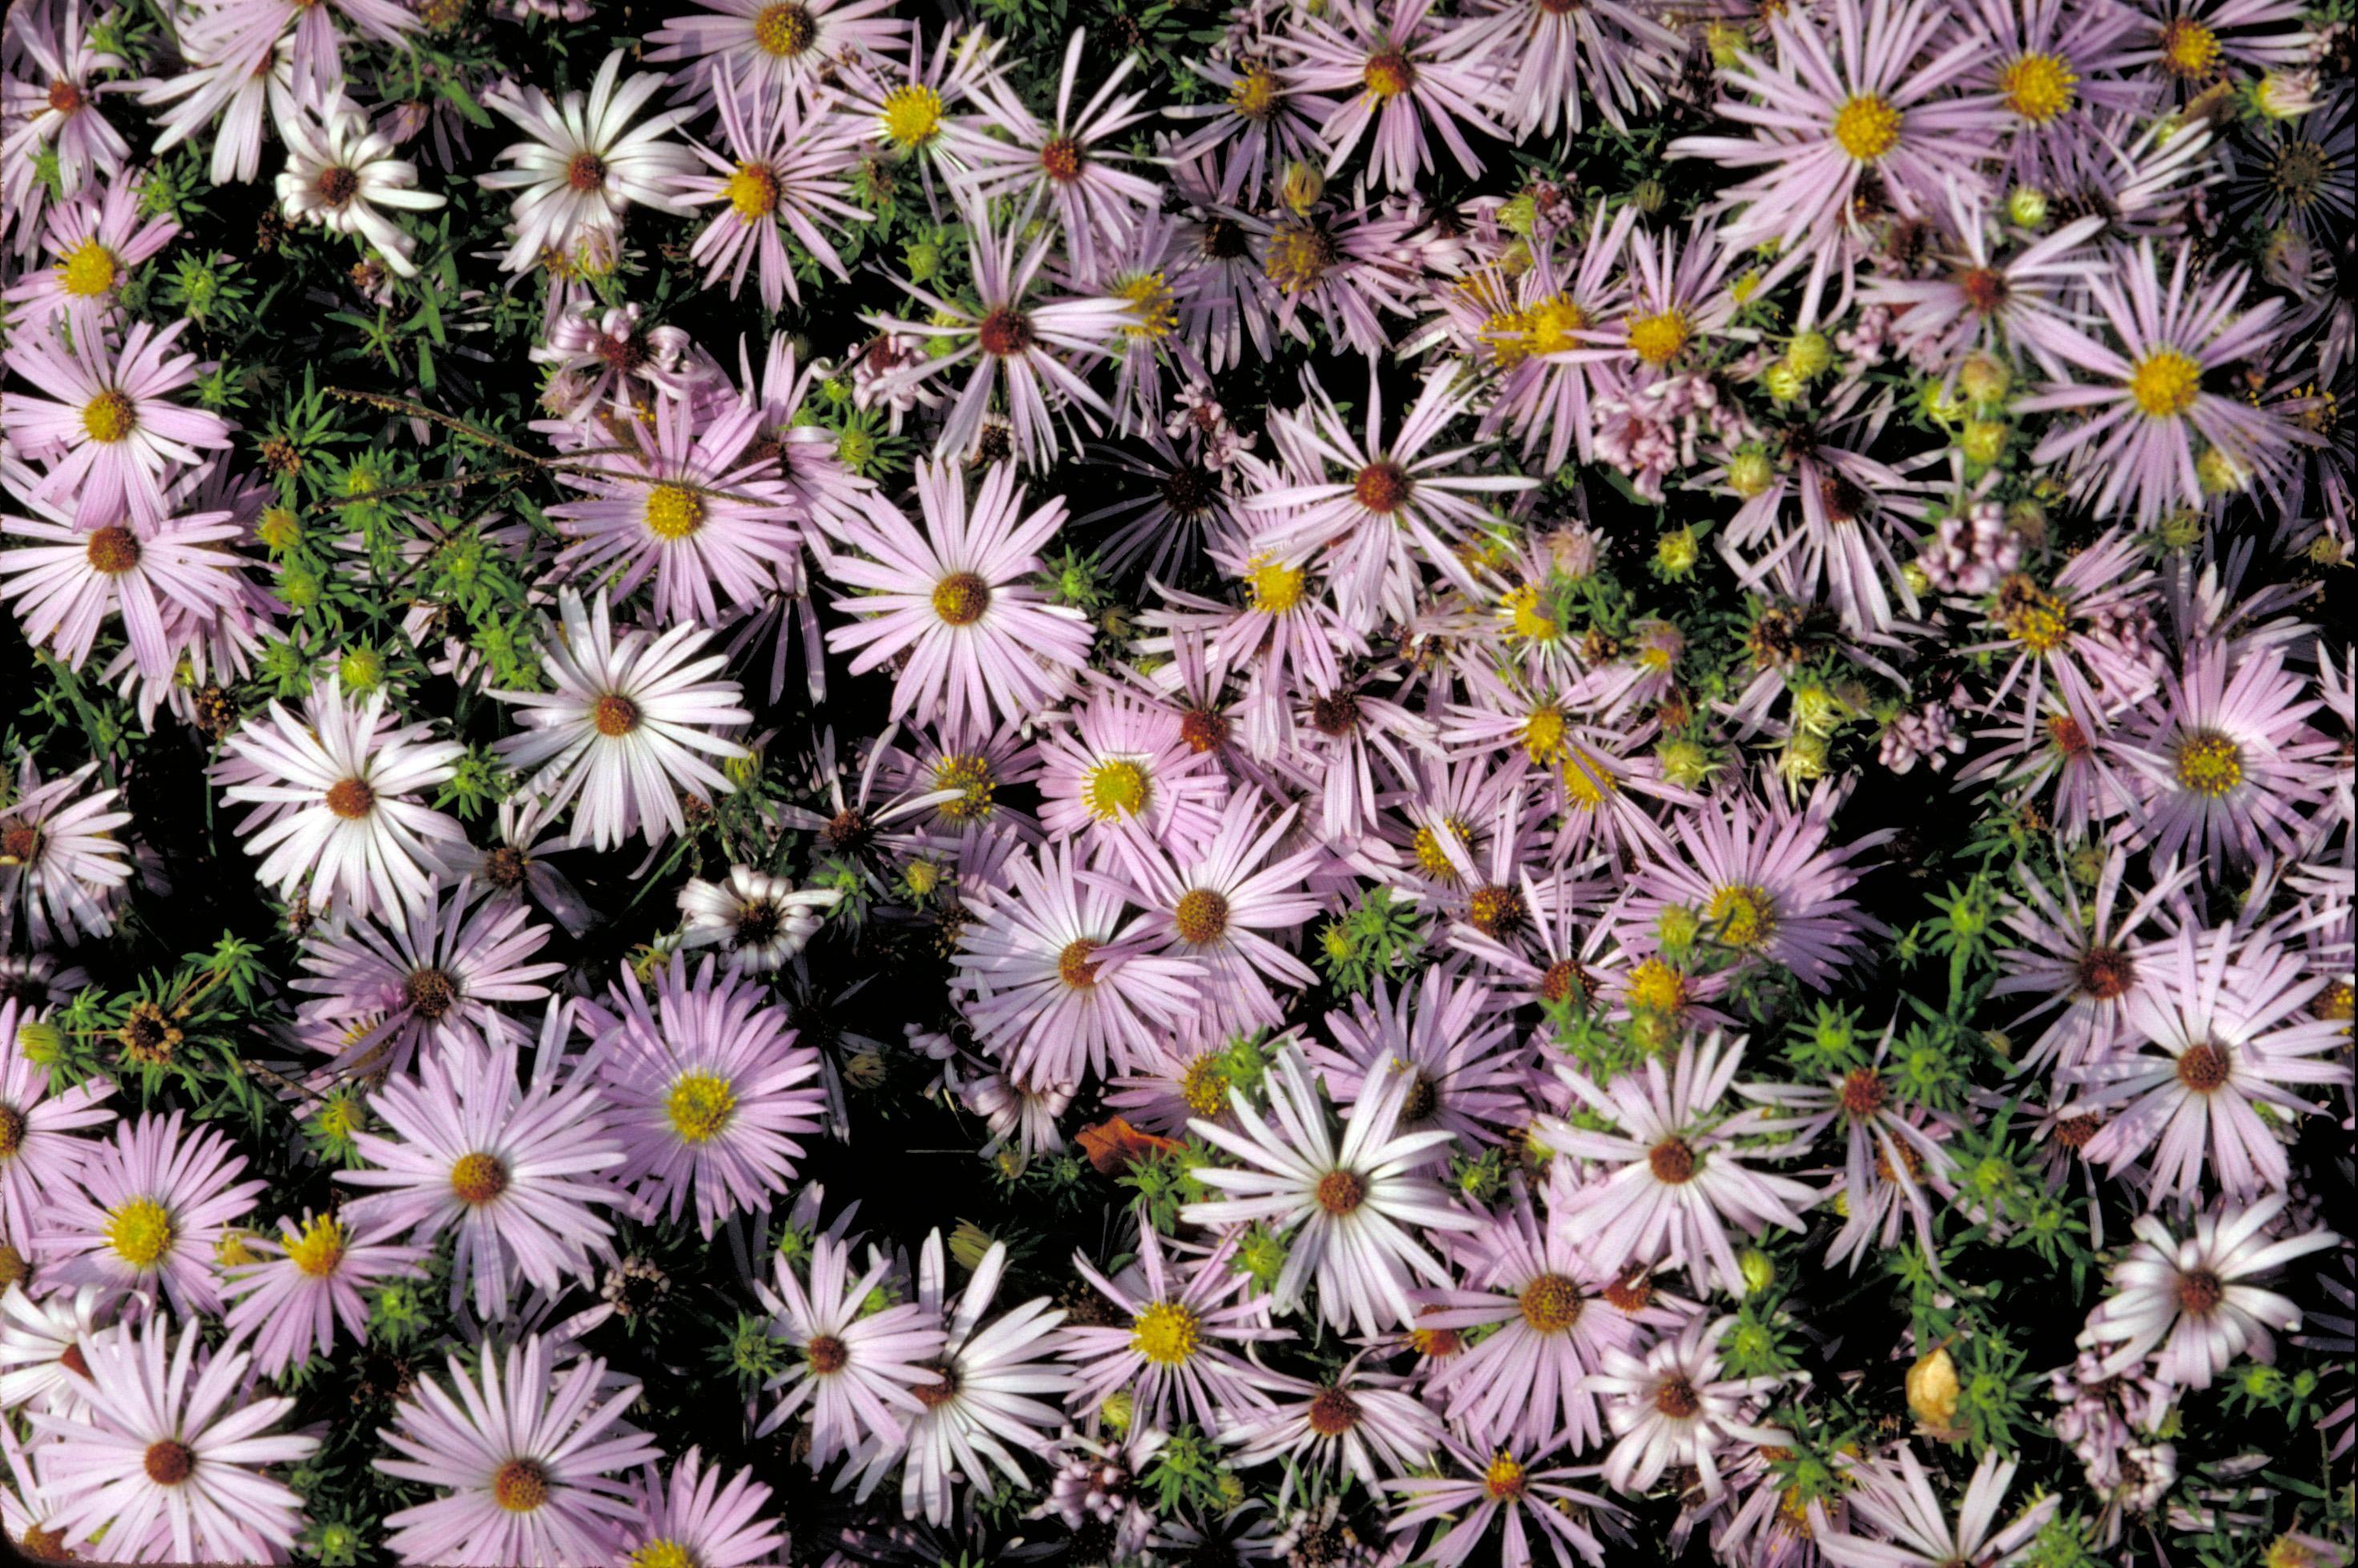 Fileshot Of Many Purple And White Flowersg Wikimedia Commons